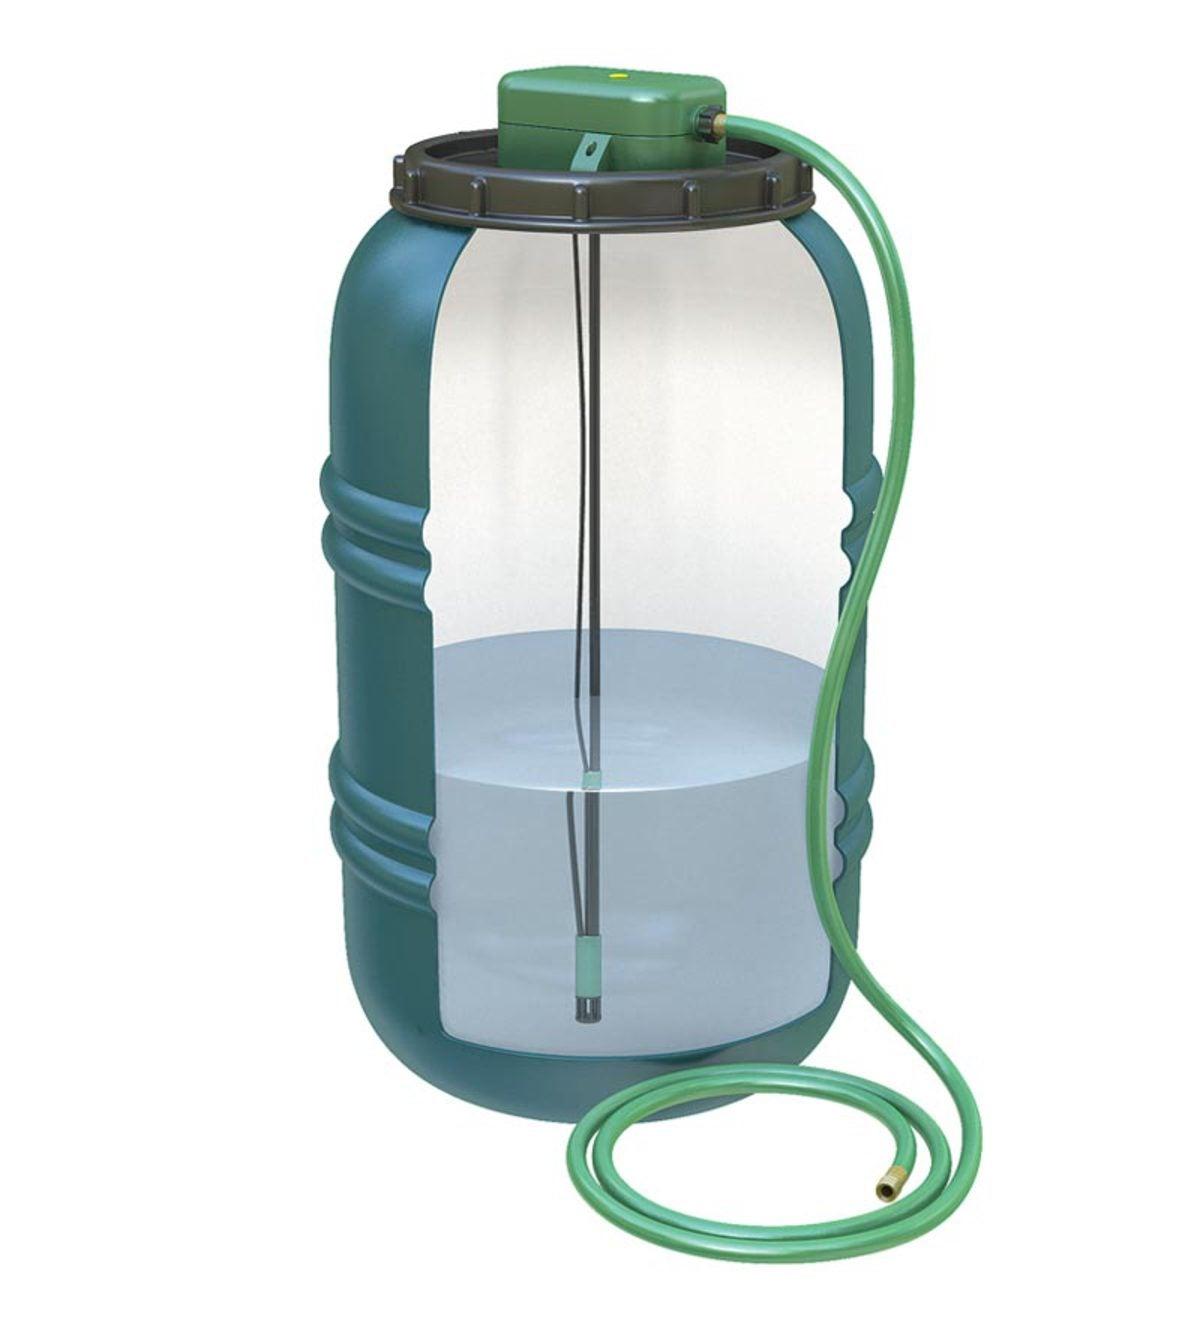 Solar Powered Rain Barrel Water Pump | PlowHearth